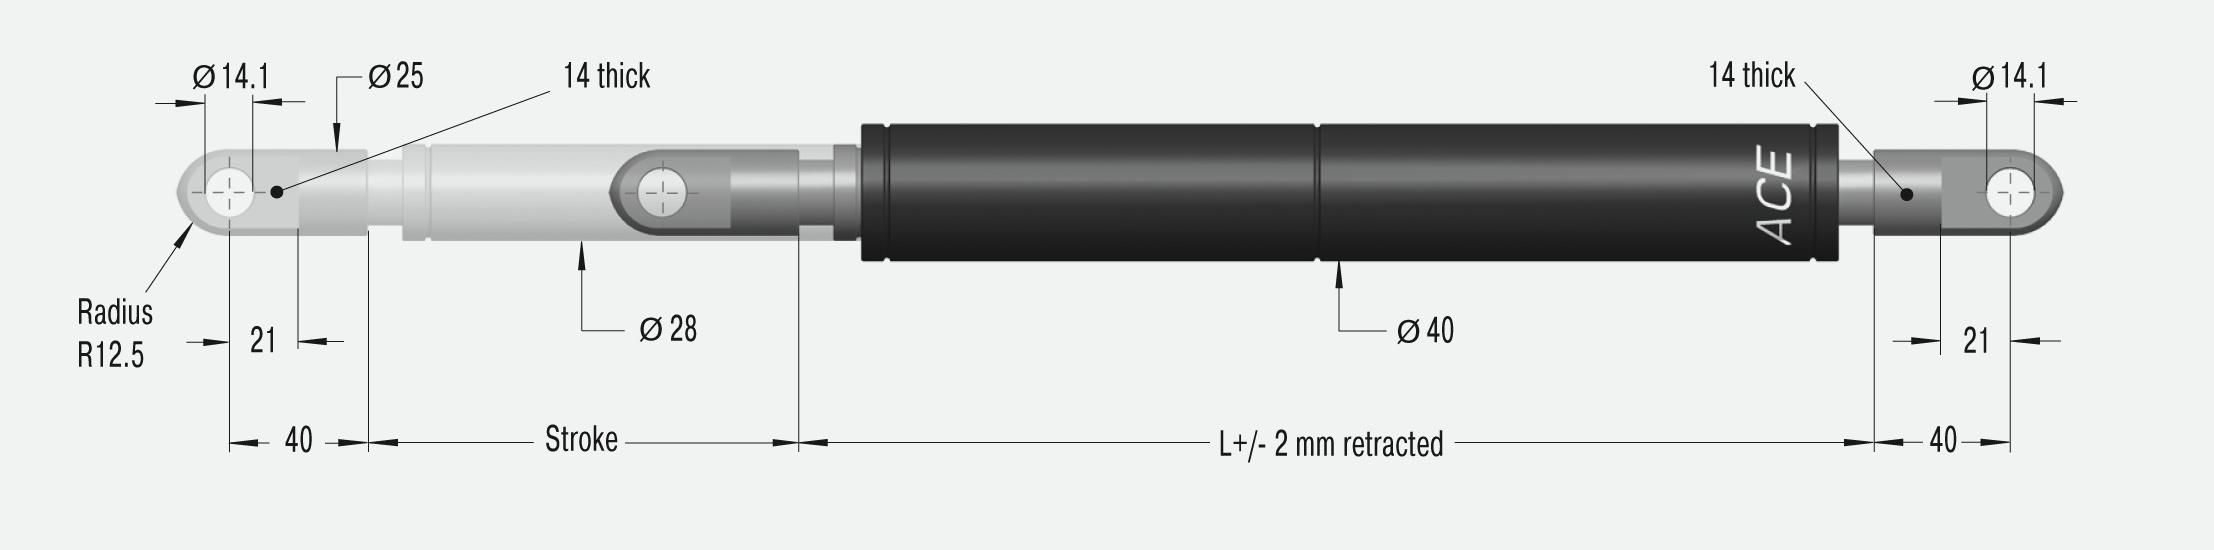 GZ-40-200